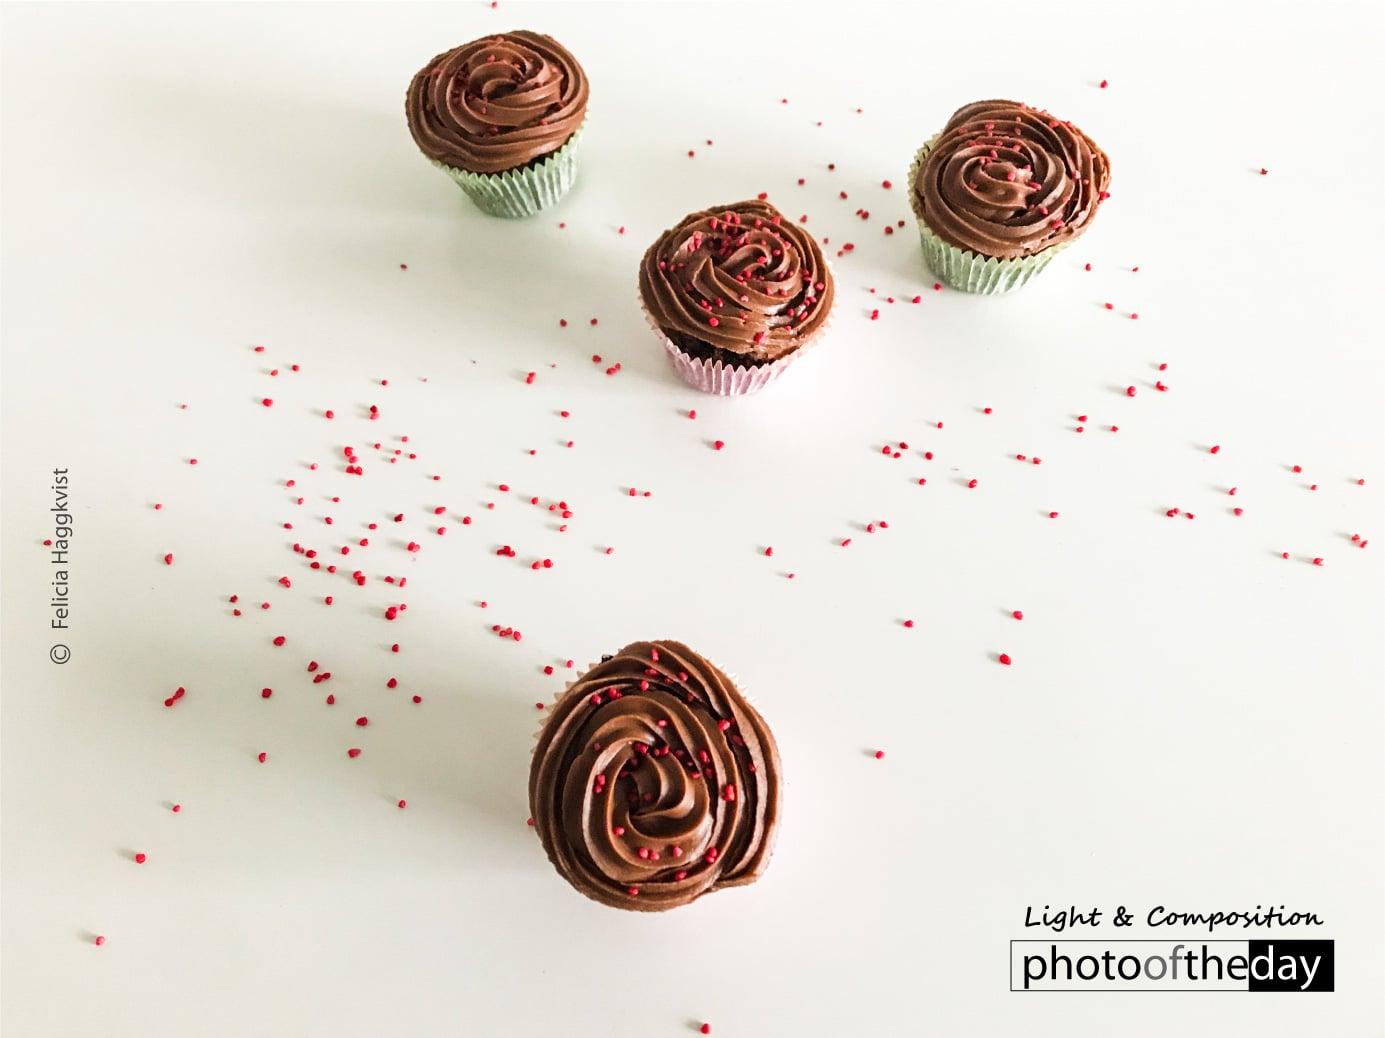 Strawberry Pancakes by Felicia Haggkvist